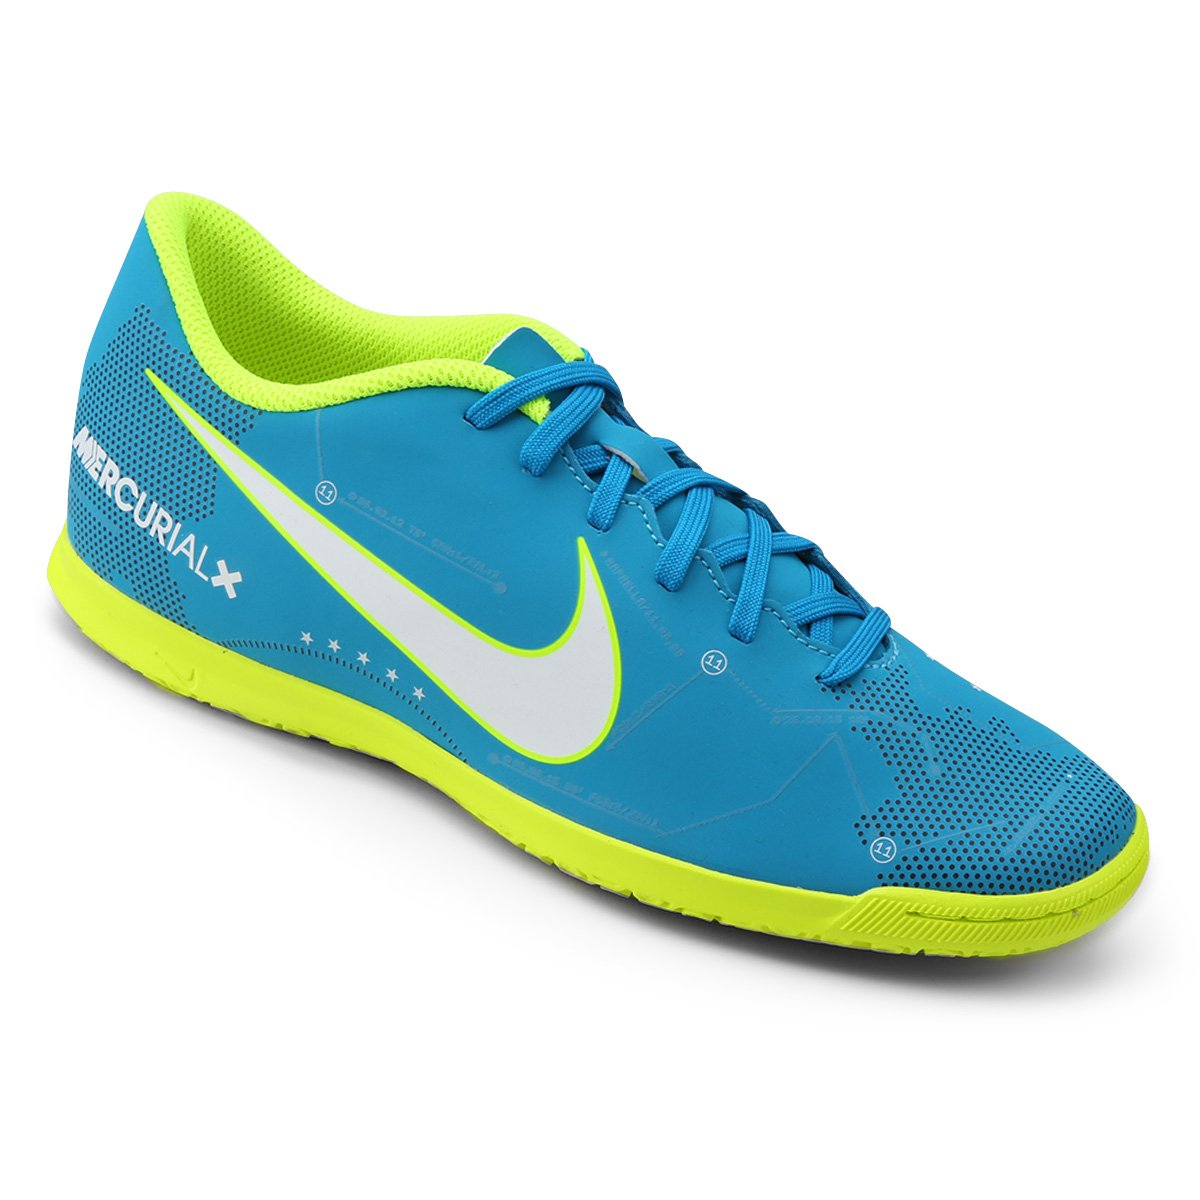 248c93e88c8 Chuteira Futsal Nike Mercurial Vortex 3 Neymar Jr IC - Compre Agora ...